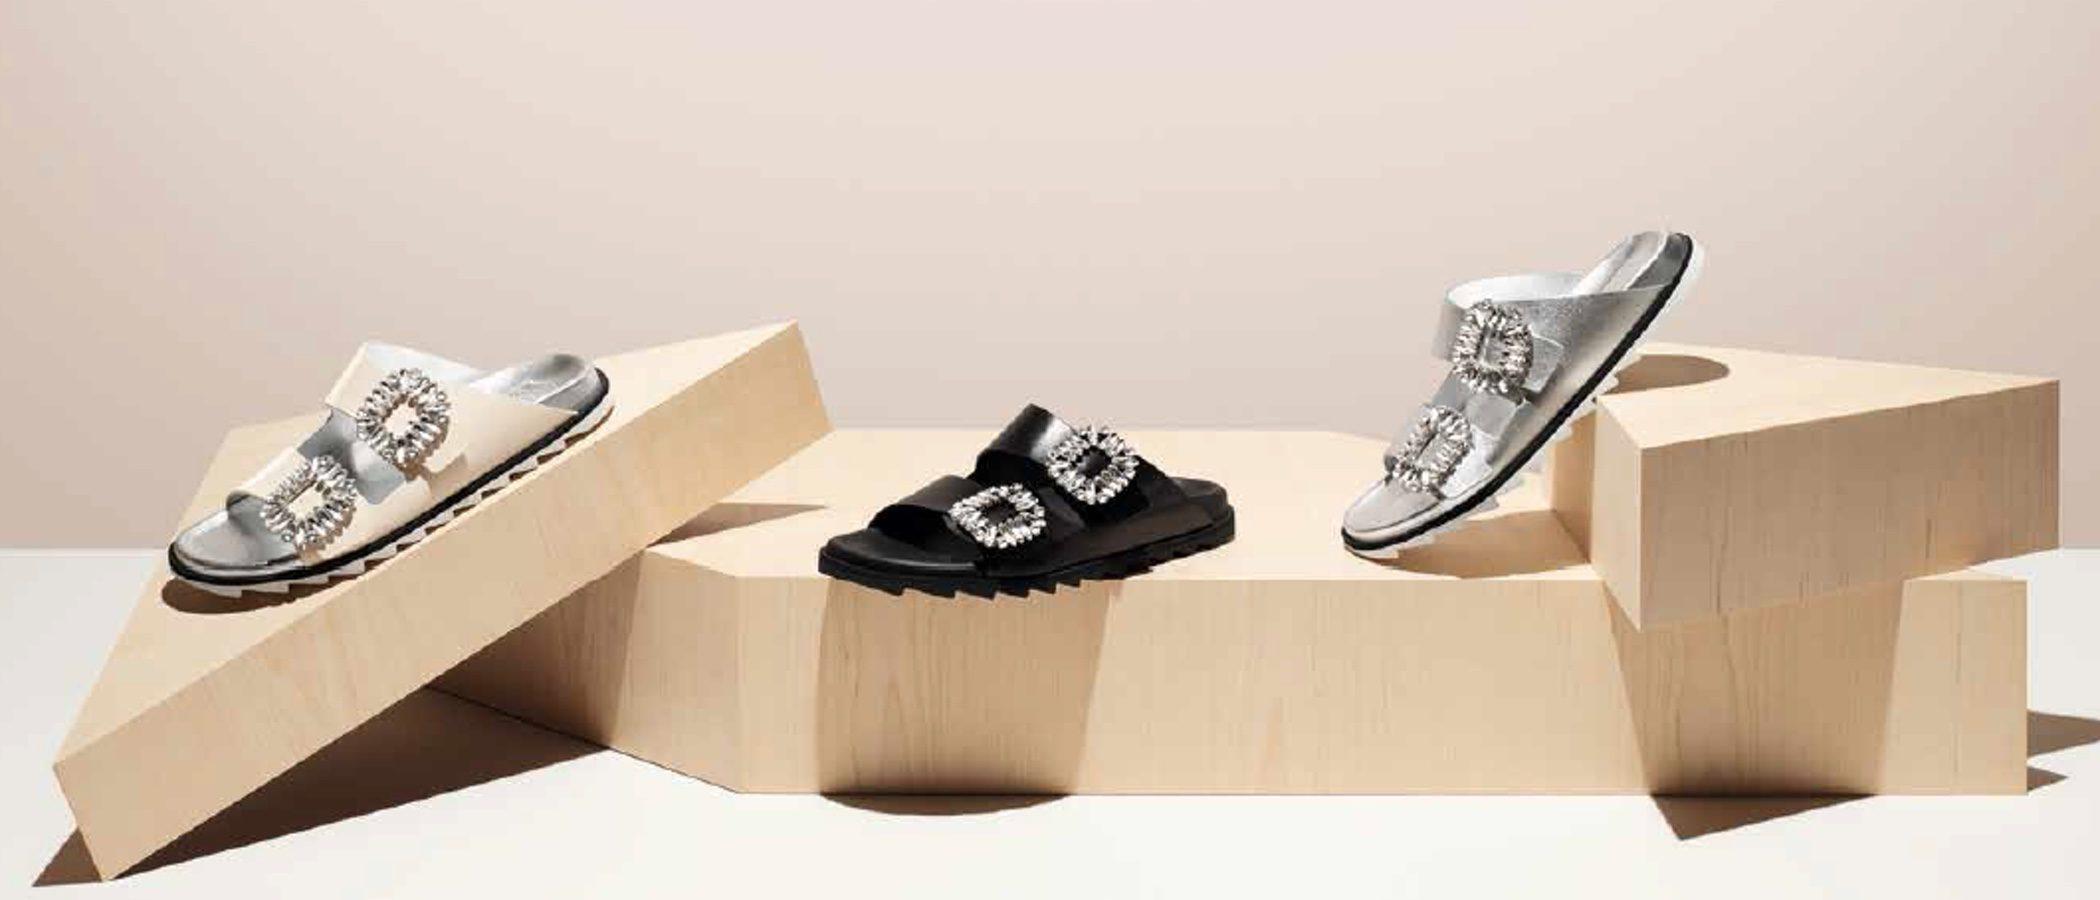 Roger Vivier presenta dos innovadores modelos de calzado para primavera/verano 2017